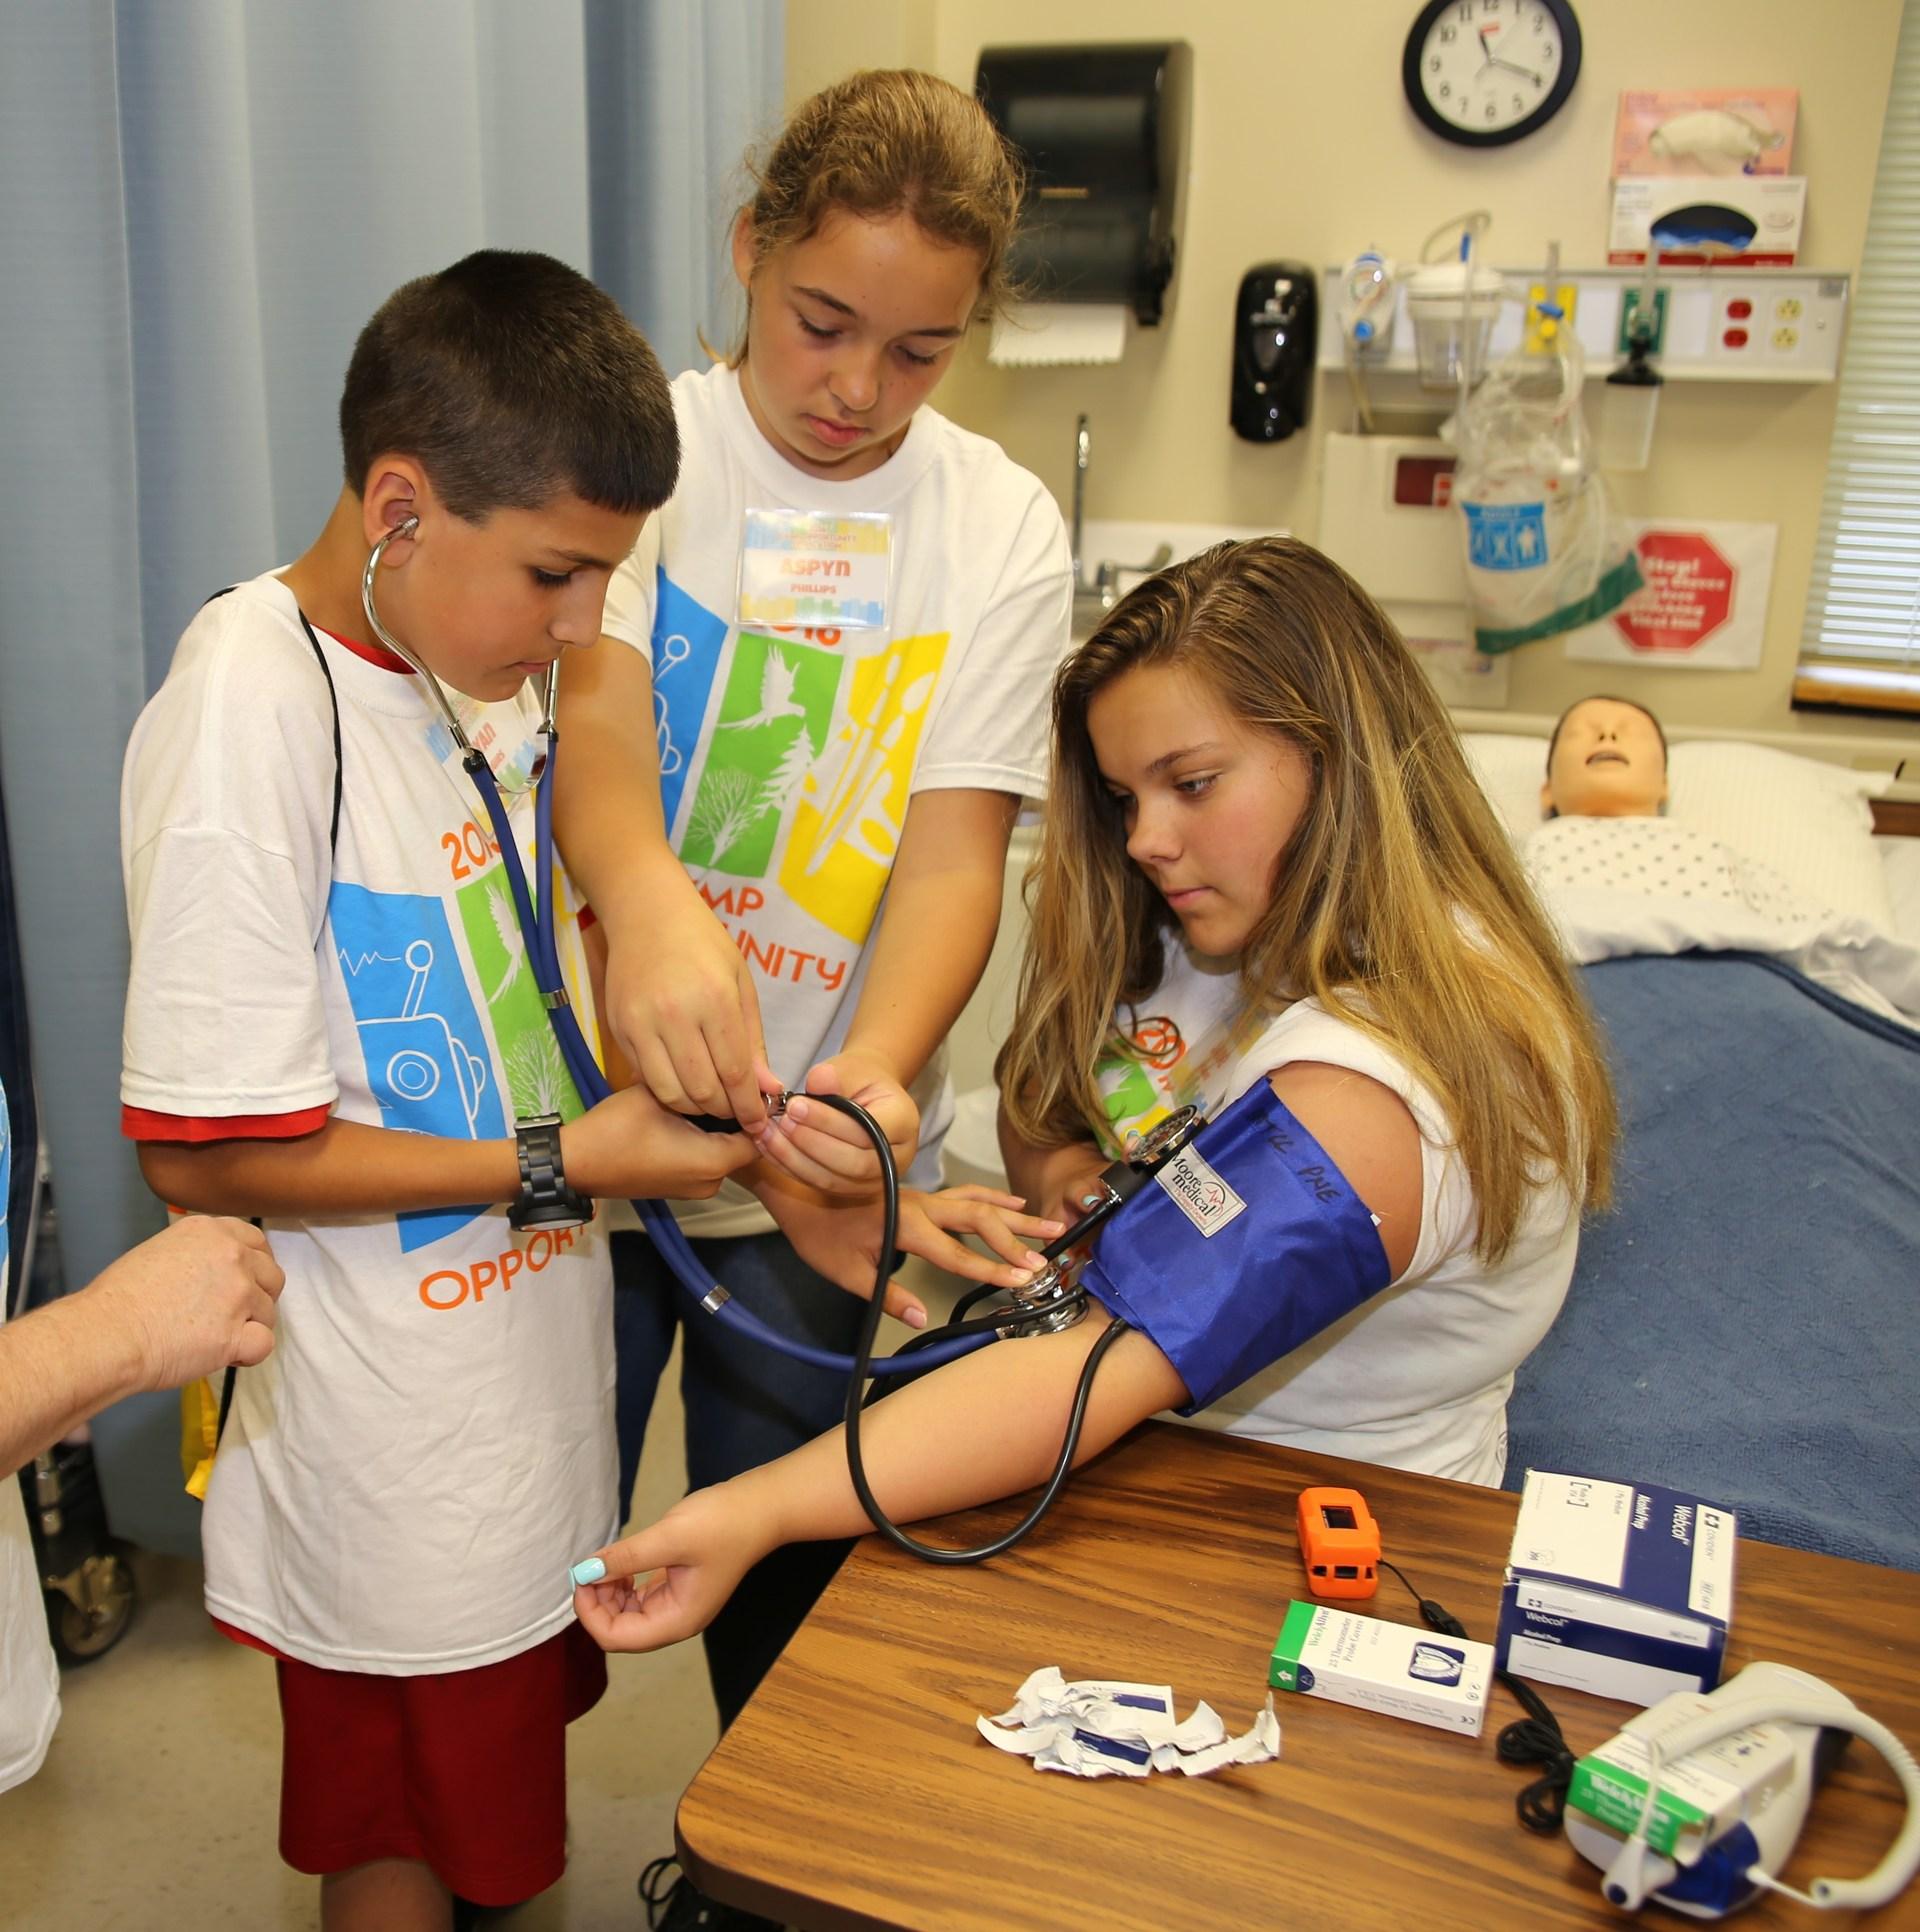 Students taking blood pressure